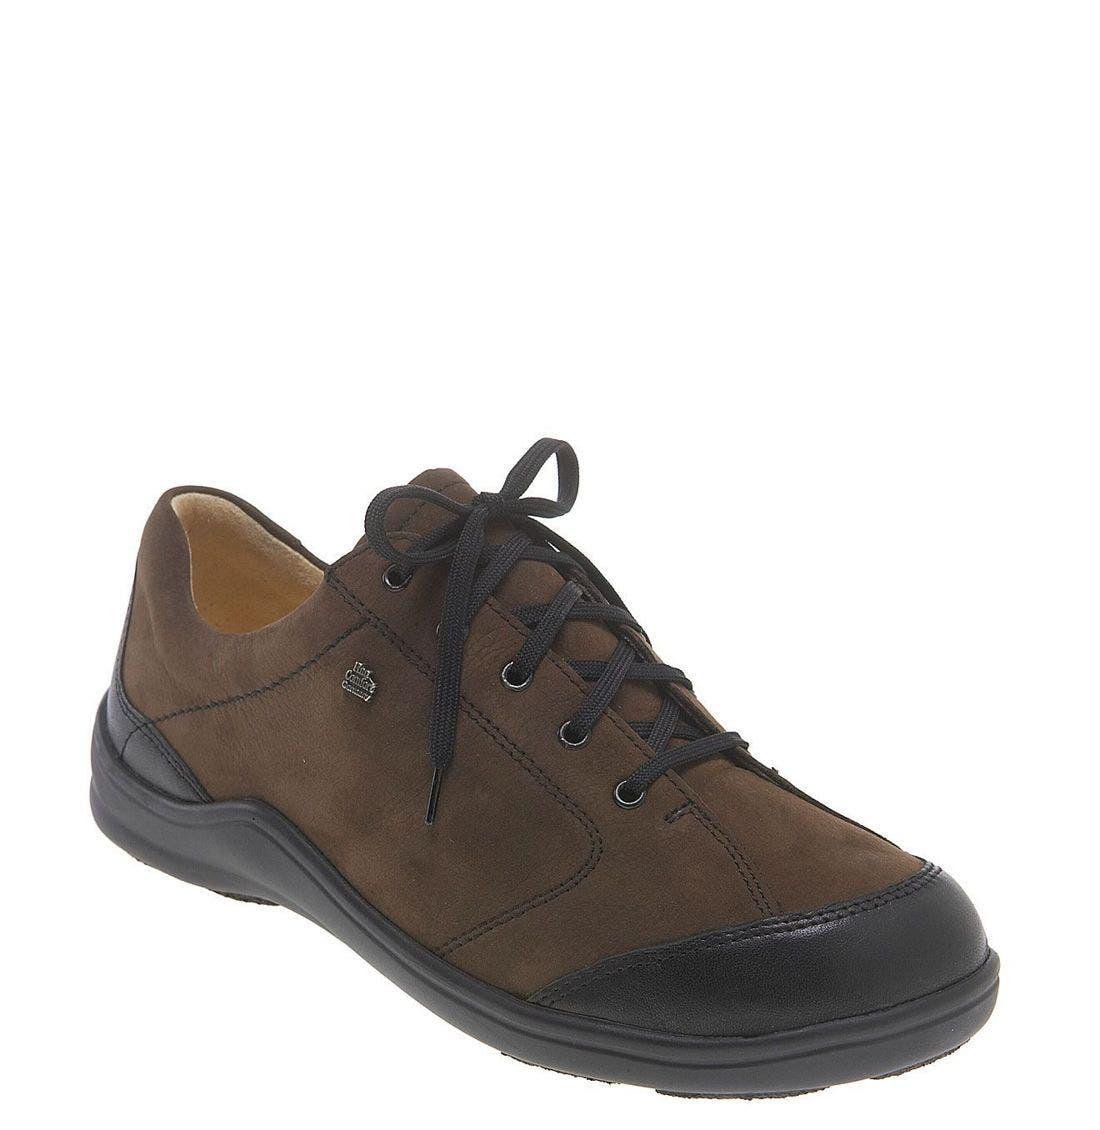 Alternate Image 1 Selected - Finn Comfort 'Cusco' Sneaker